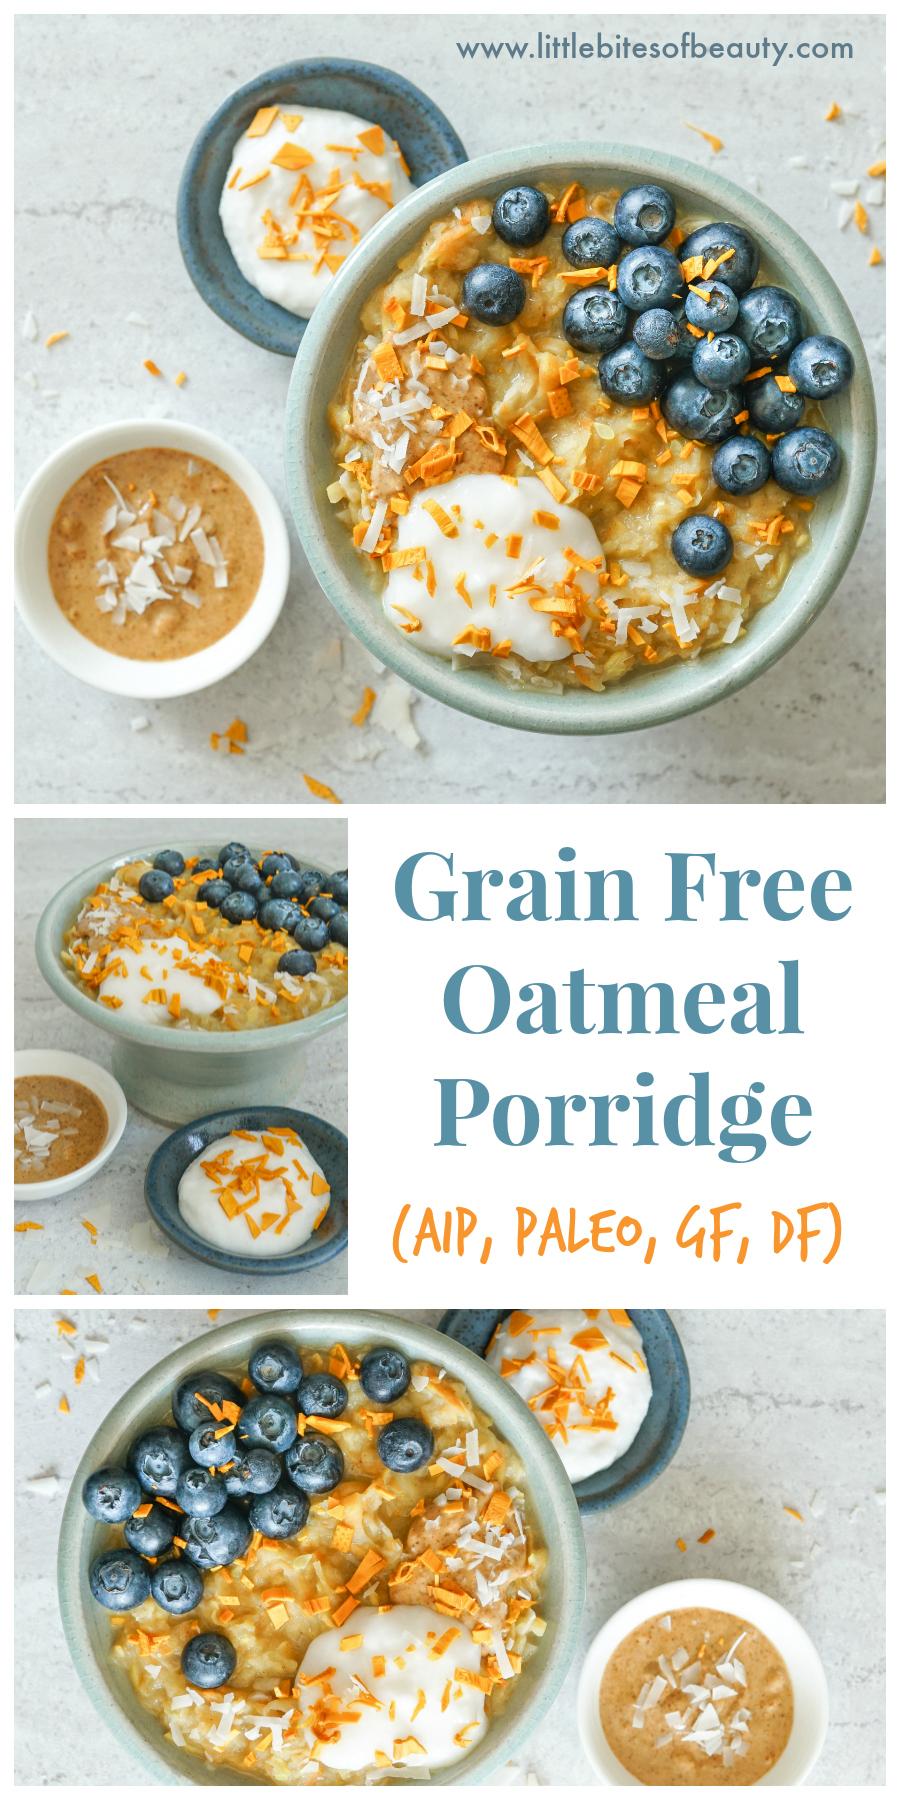 _Grain Free Paleo Oatmeal Porridge (Dairy & Gluten Free, AIP), AIP)